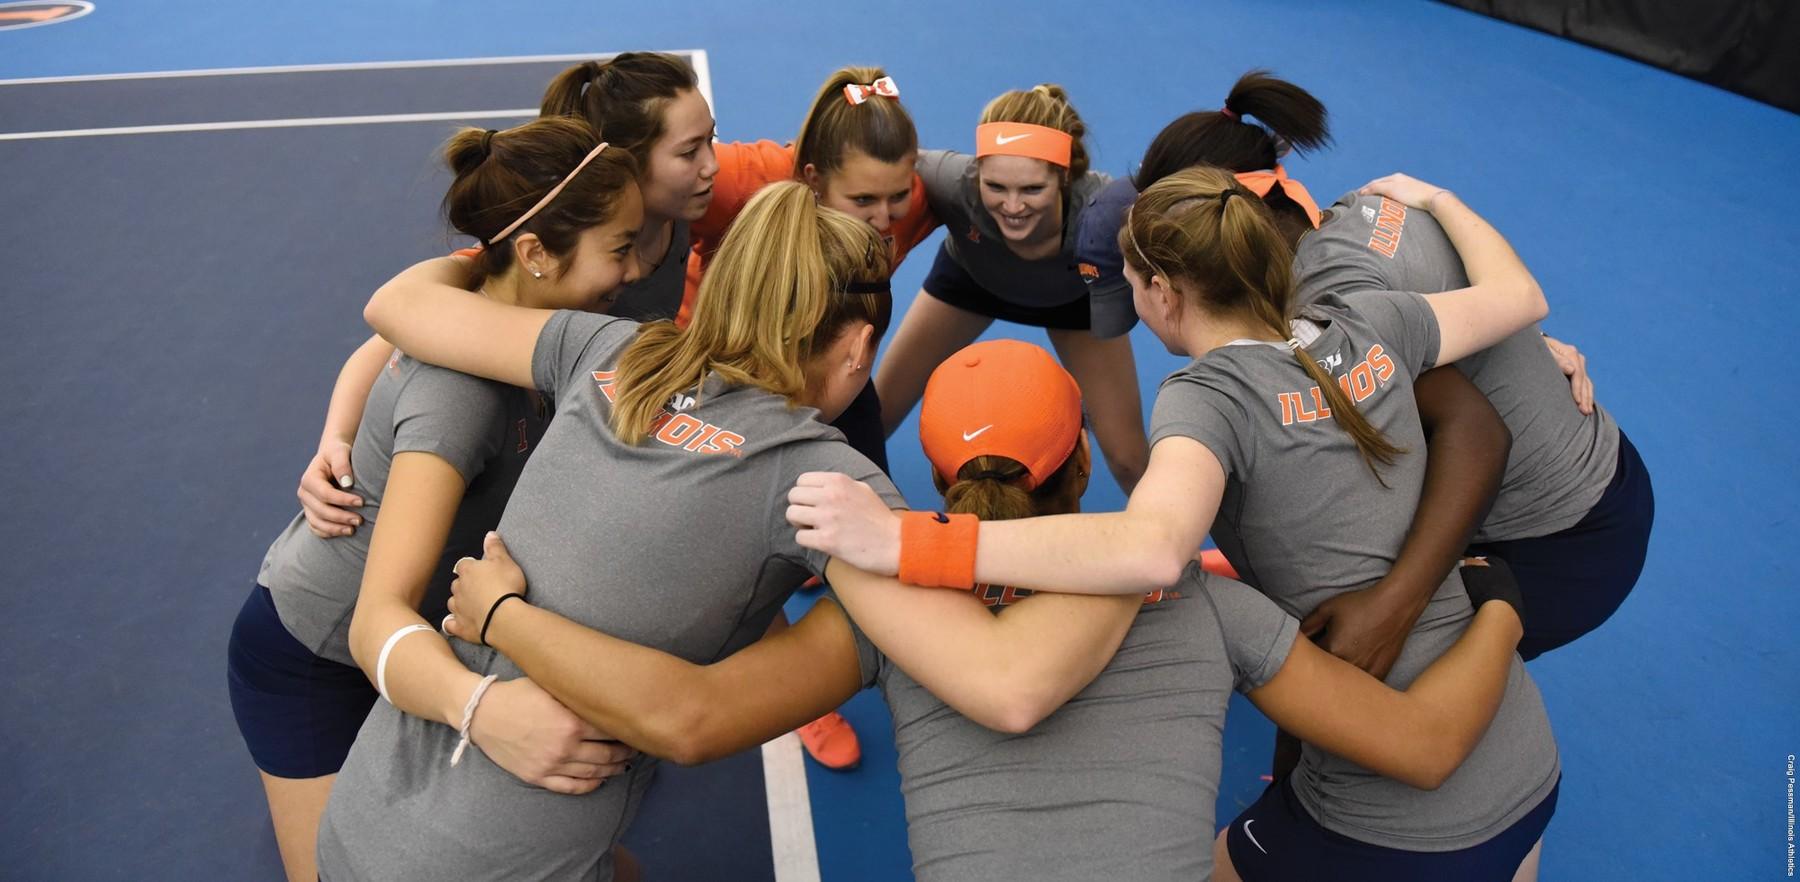 image of Illini tennis players huddling and smiling